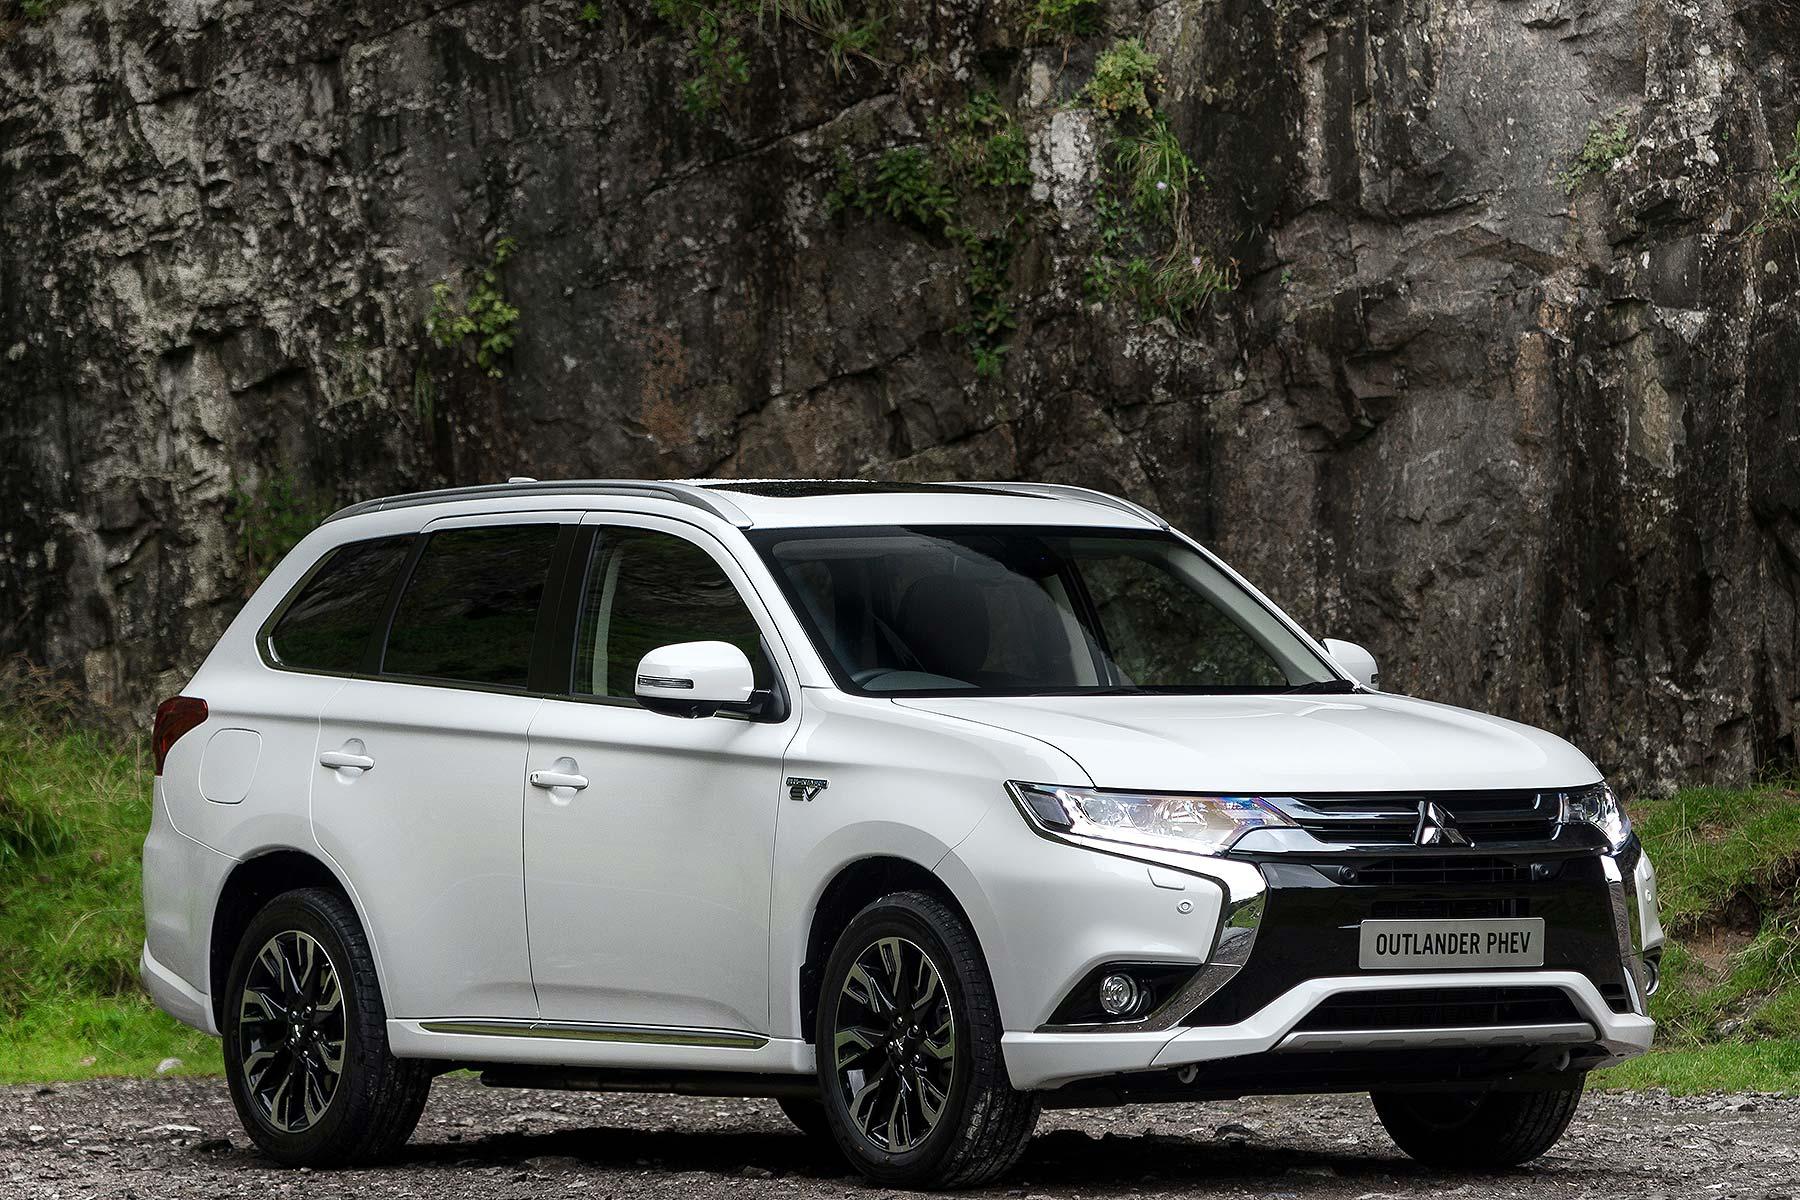 2016 Mitsubishi Outlander PHEV Review: UK First Drive